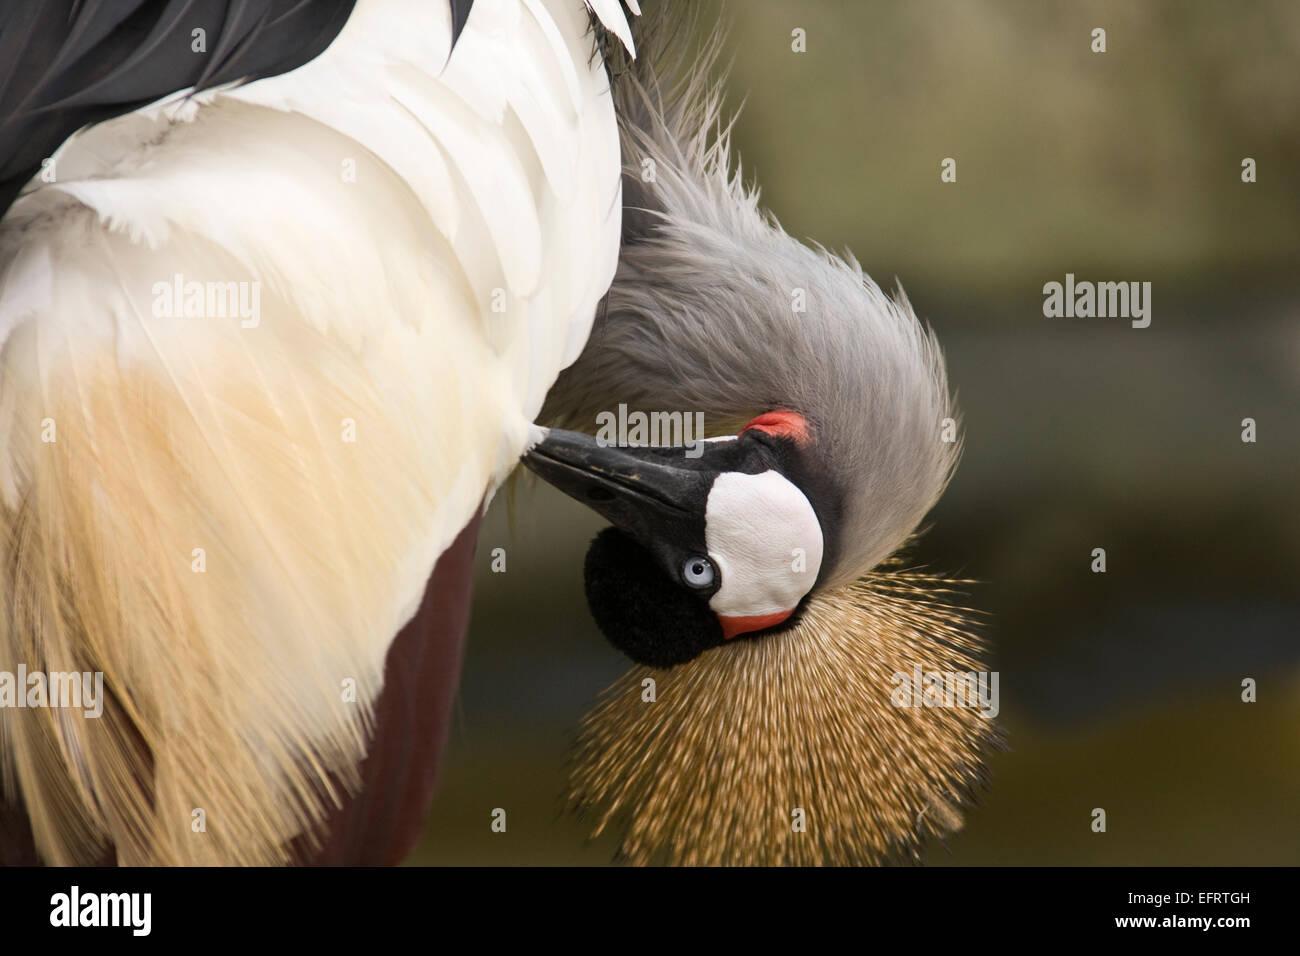 Black crowned Crane (Balearica pavonina), Africa - Stock Image